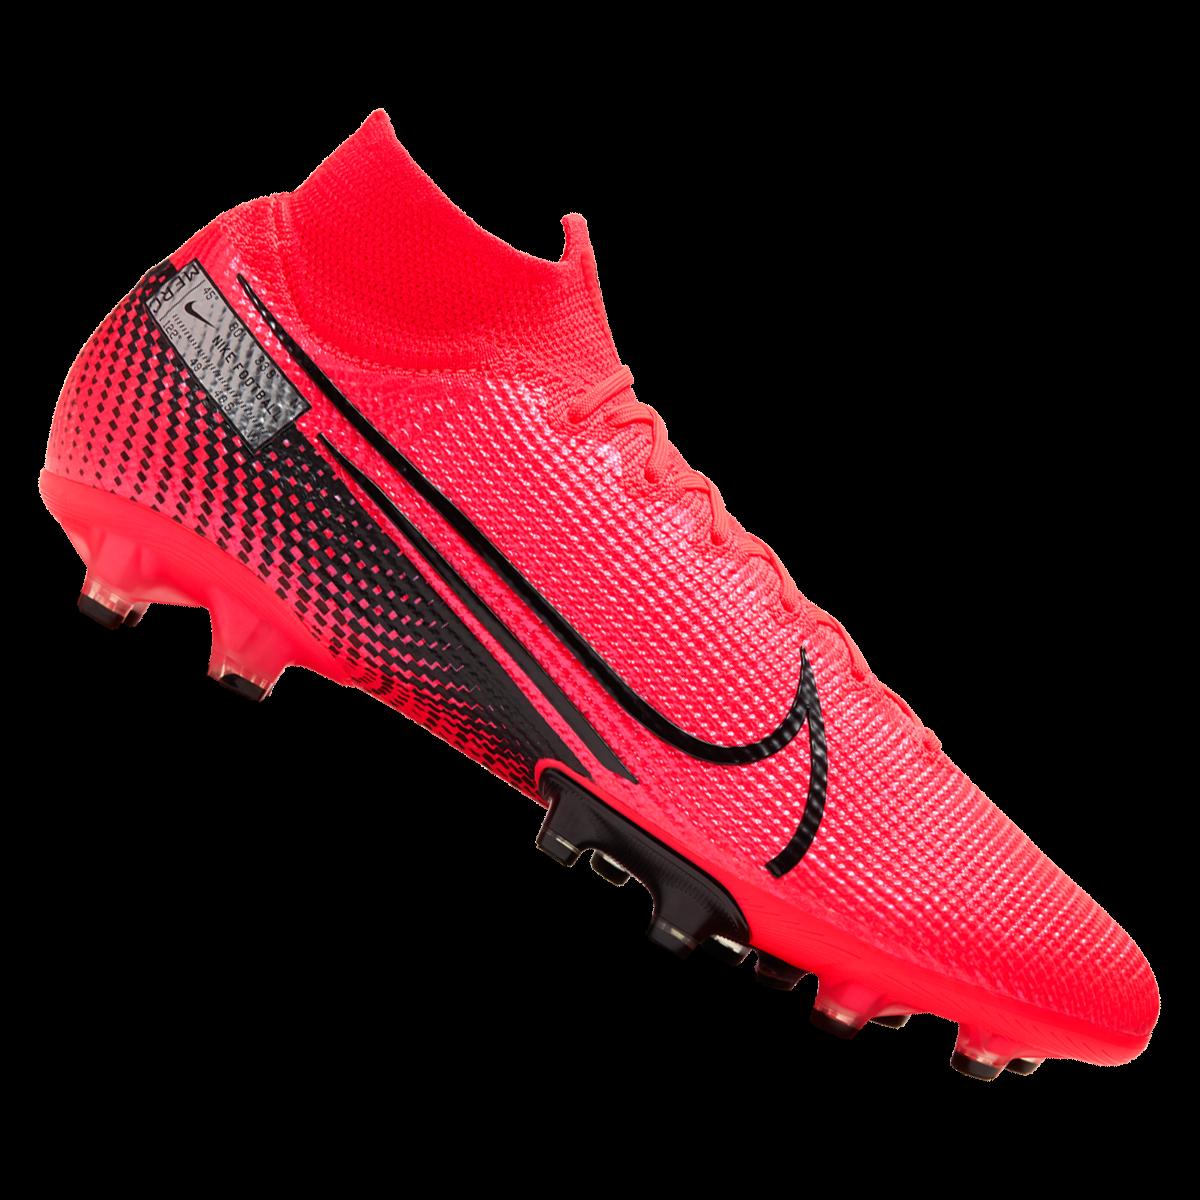 Nike voetbalschoenen Mercurial Superfly VII Elite AG Pro roodzwart